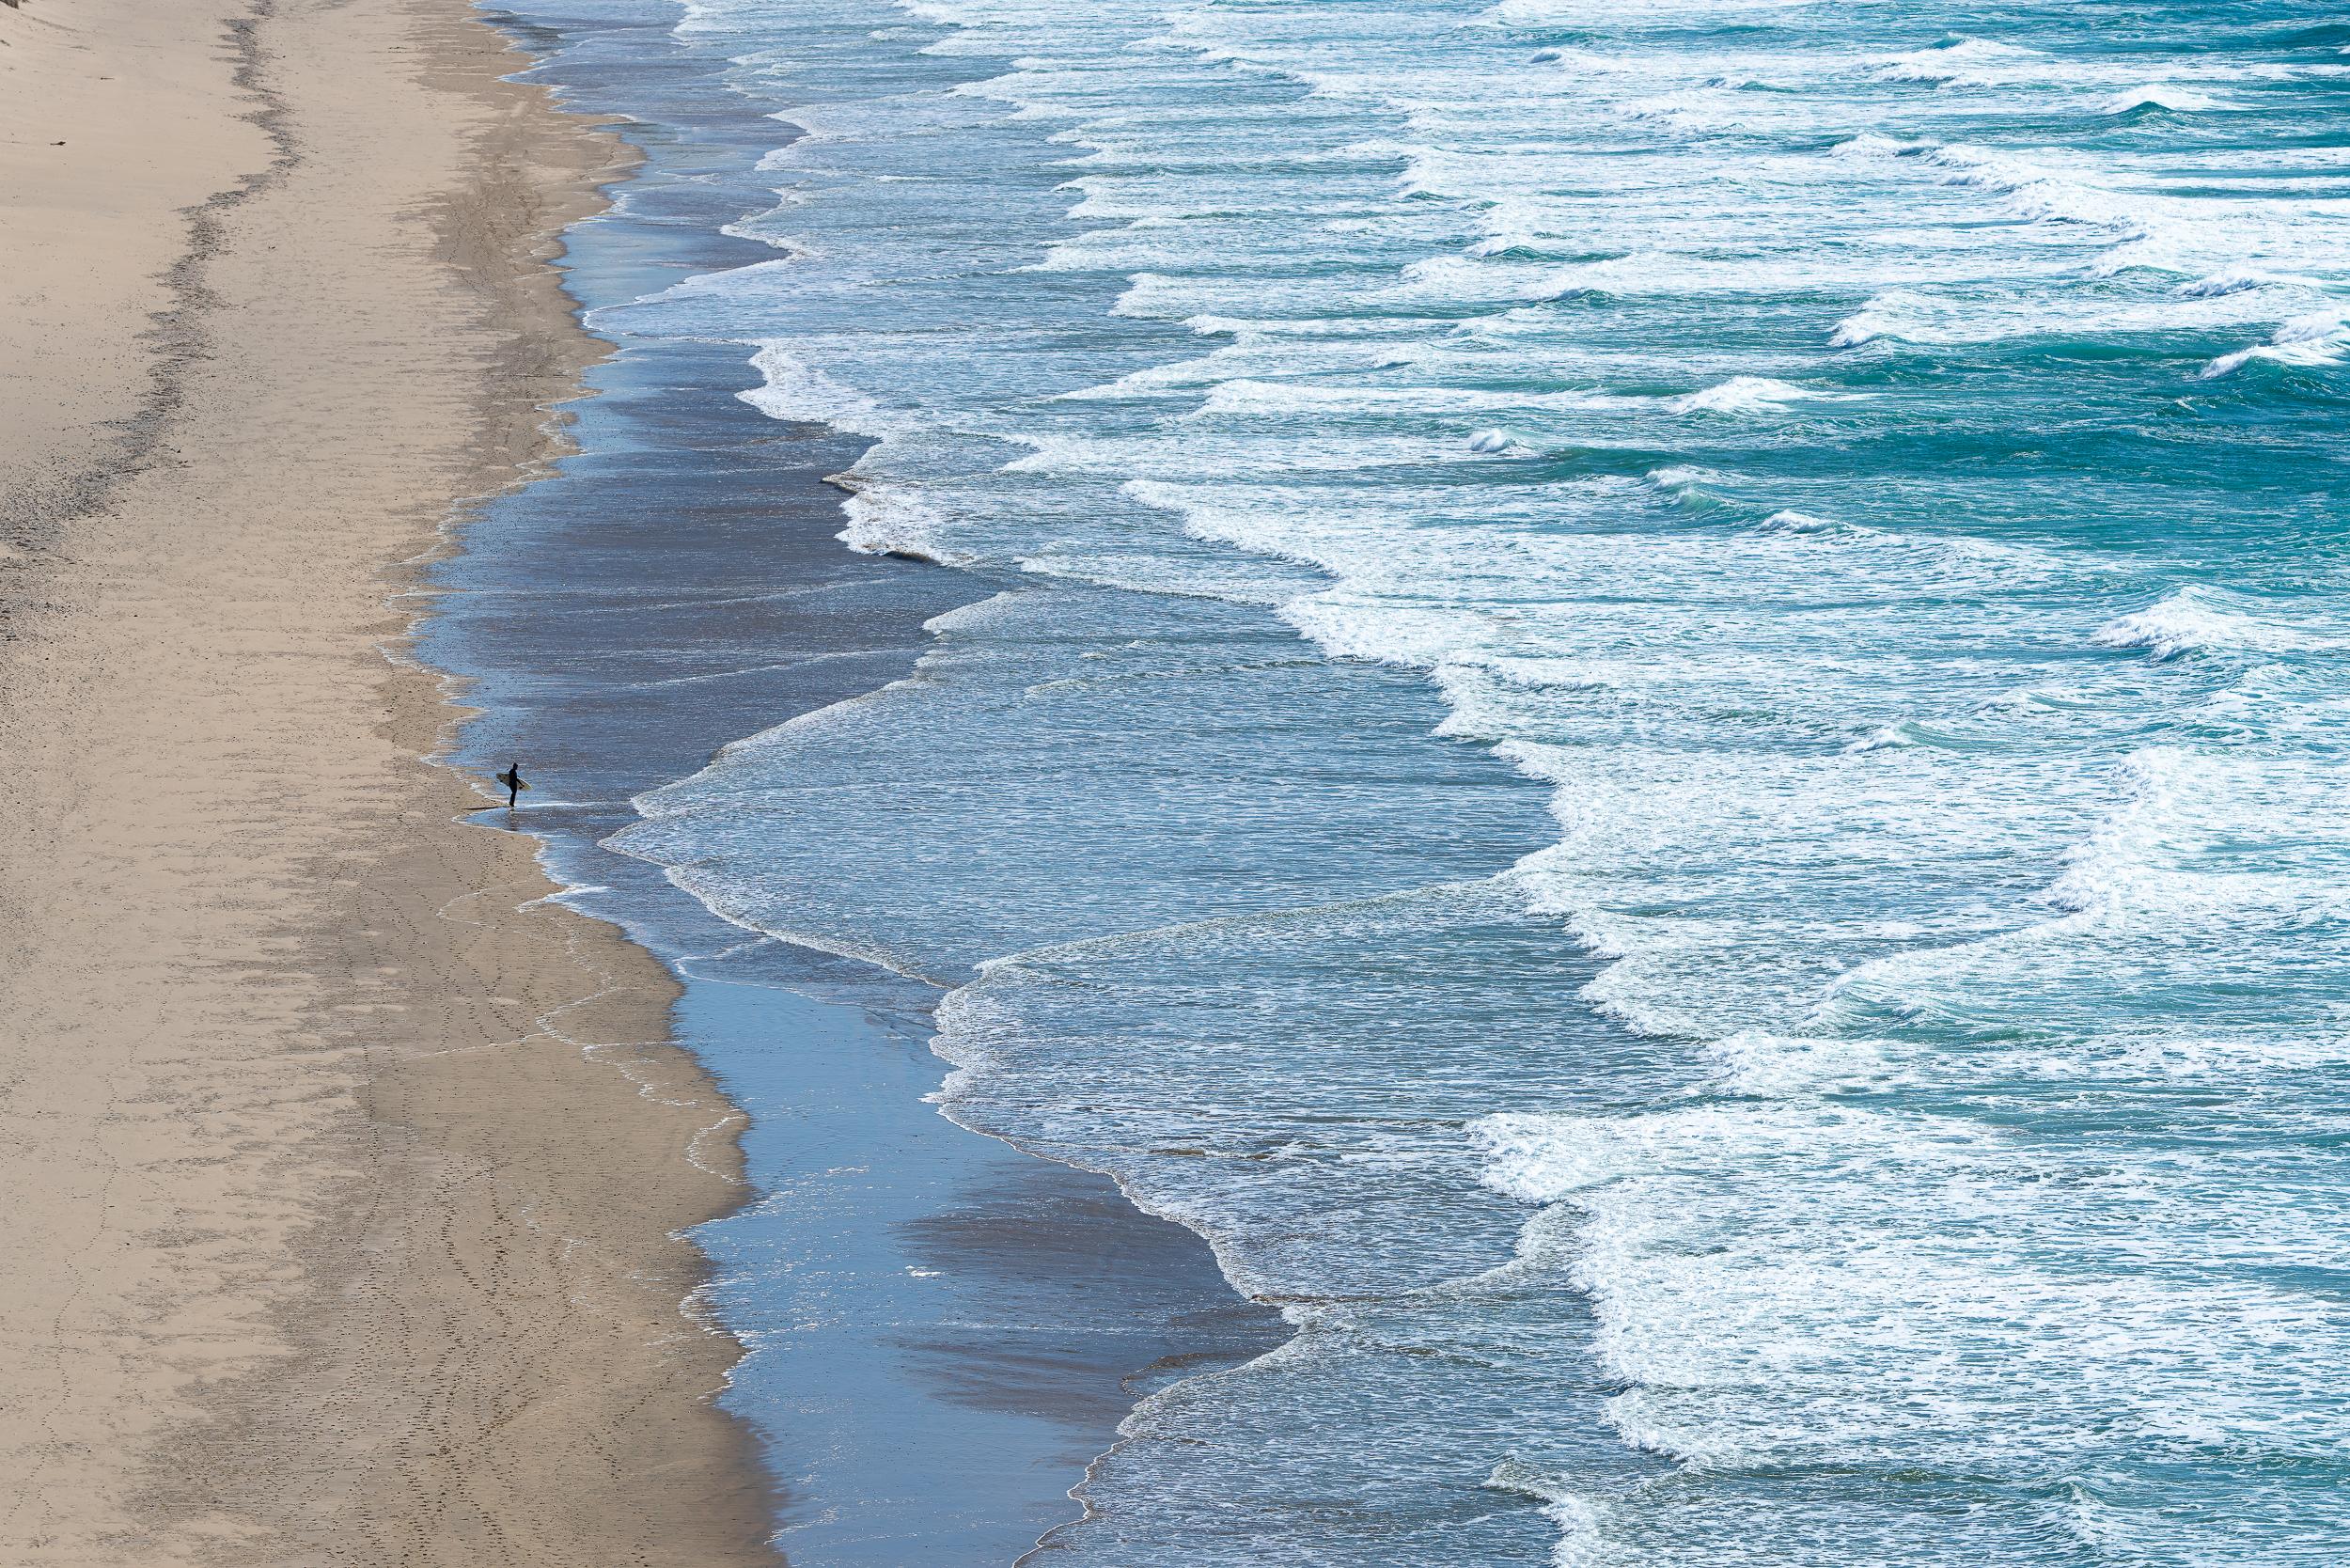 surfer-sand-beach-waves.jpg